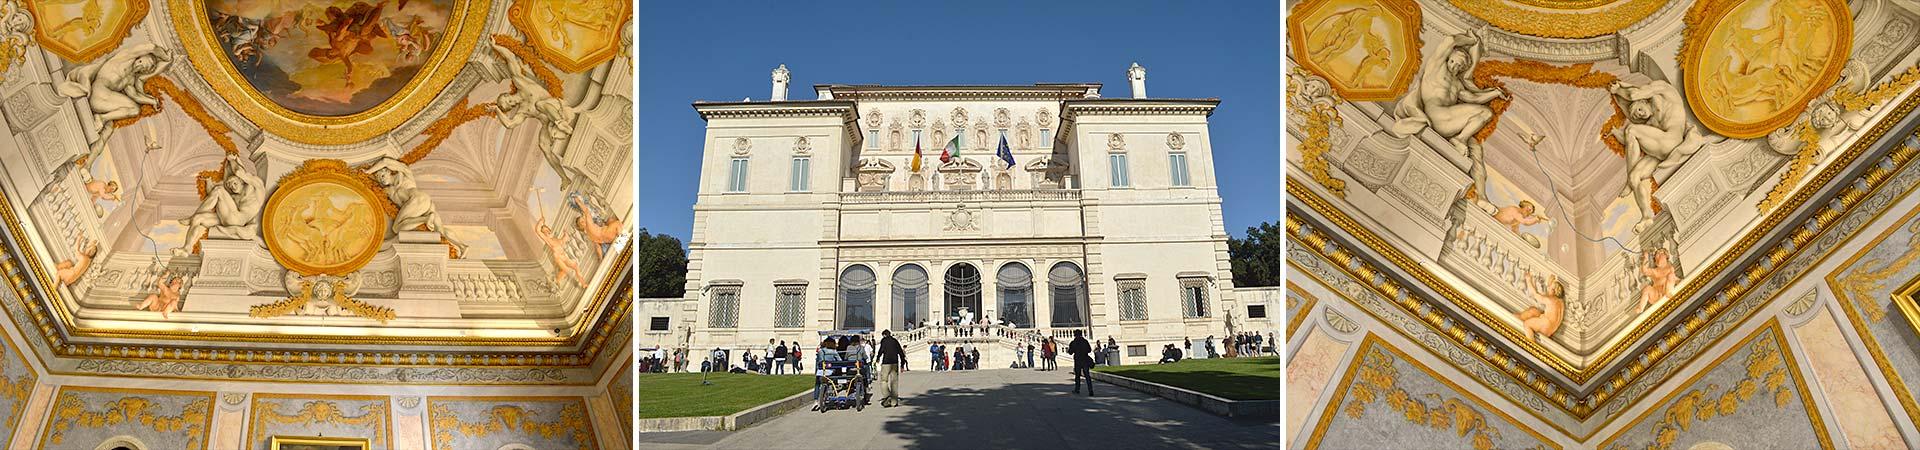 borghese tour rome